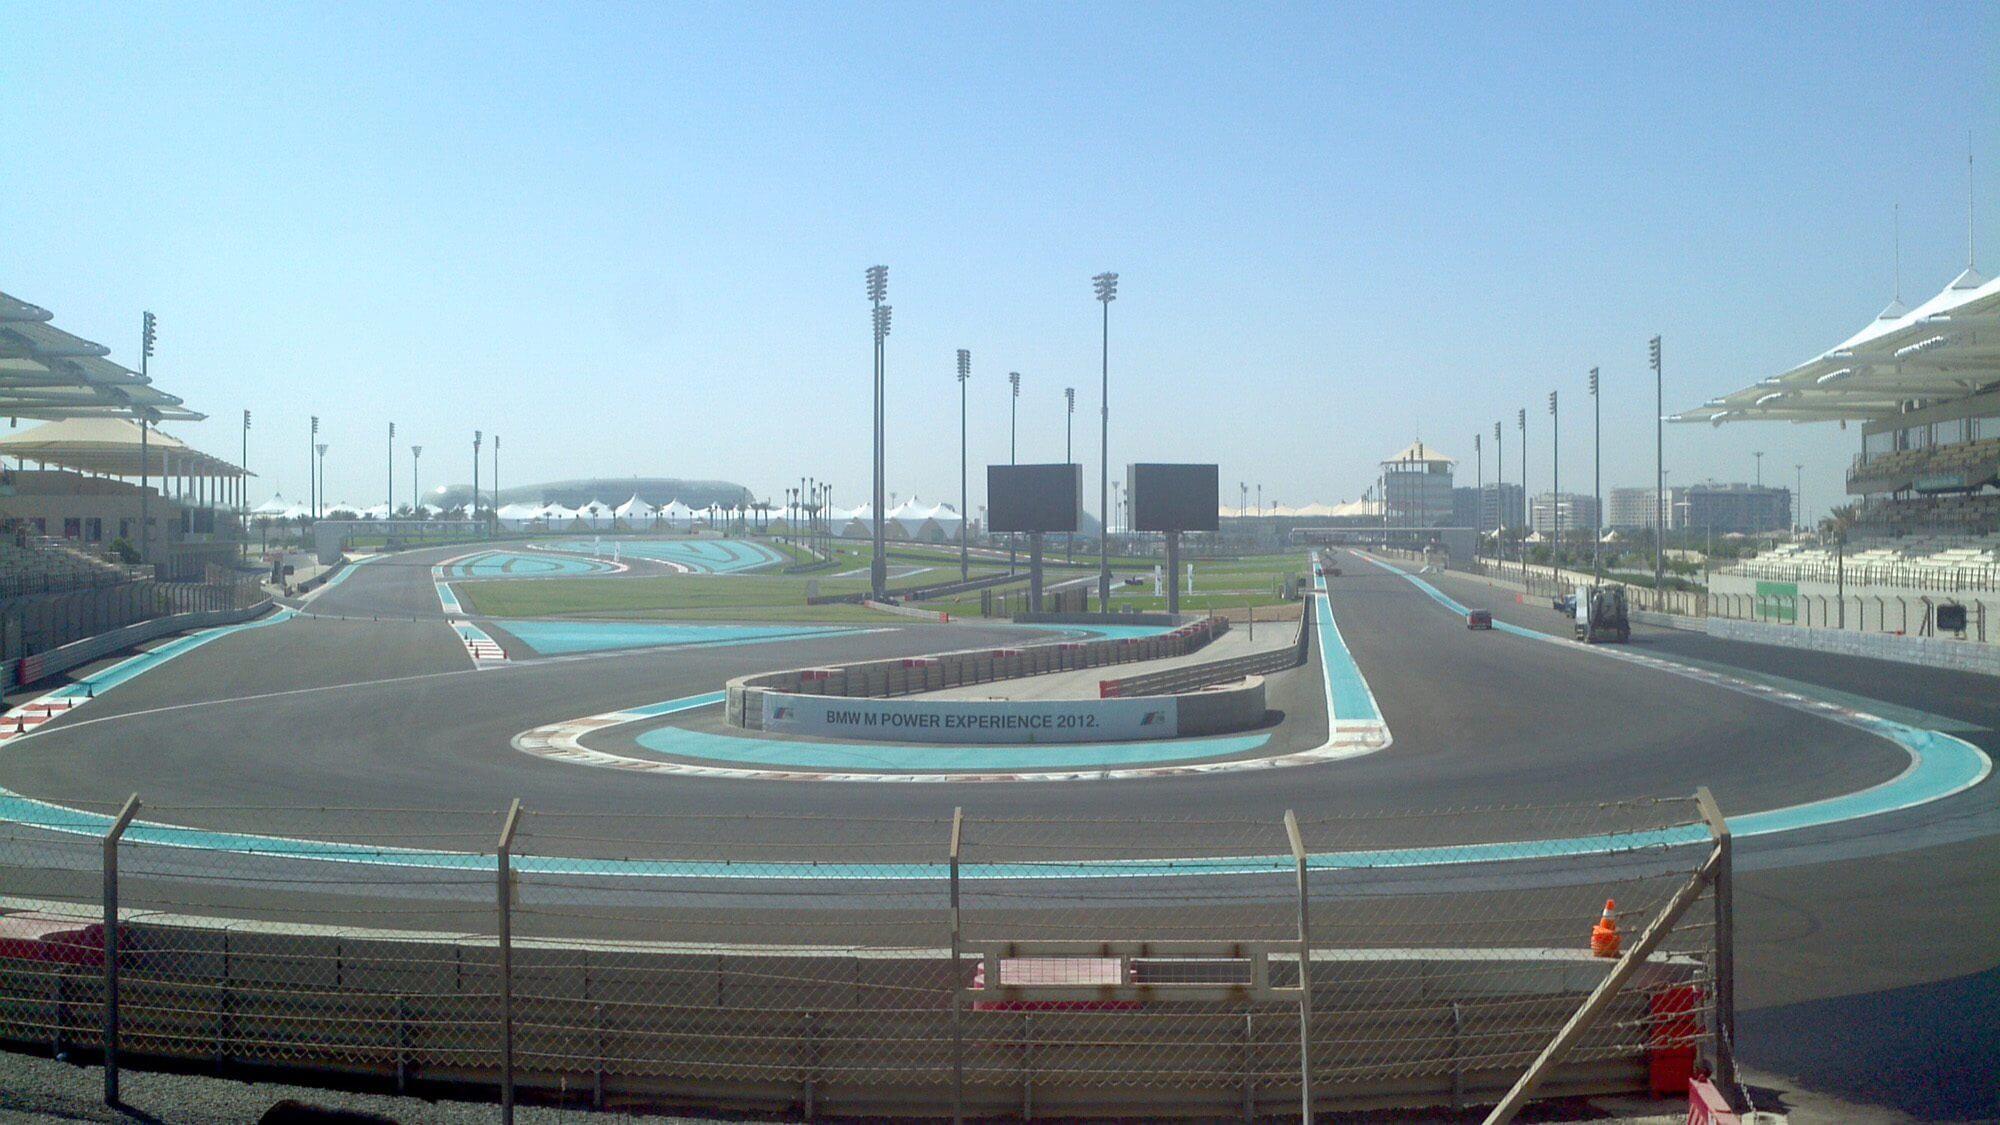 Dubai Formular 1 yasmarina1